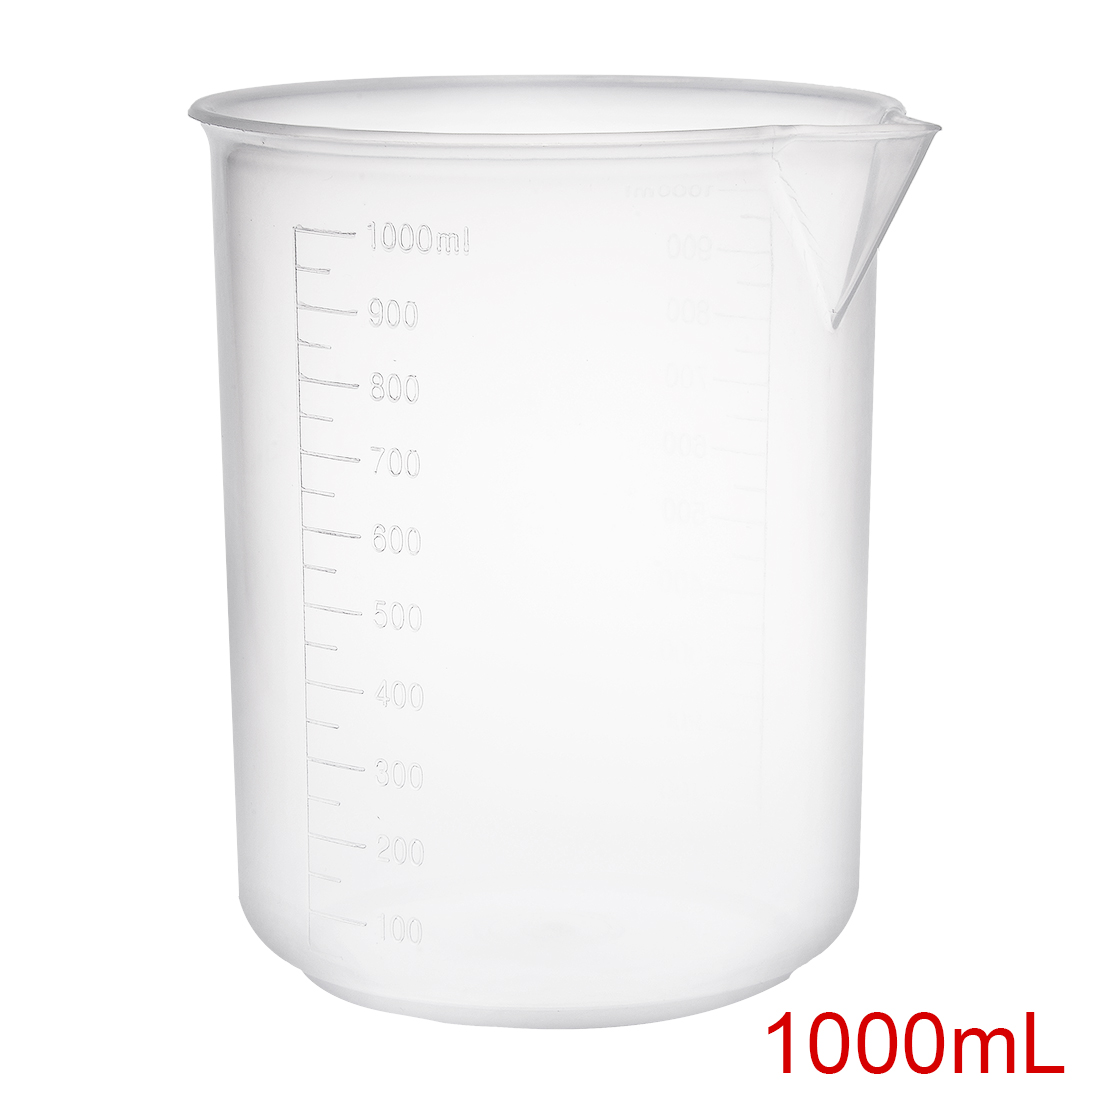 2pcs Measuring Cup Labs PP Graduated Beakers 1000ml by Unique-Bargains